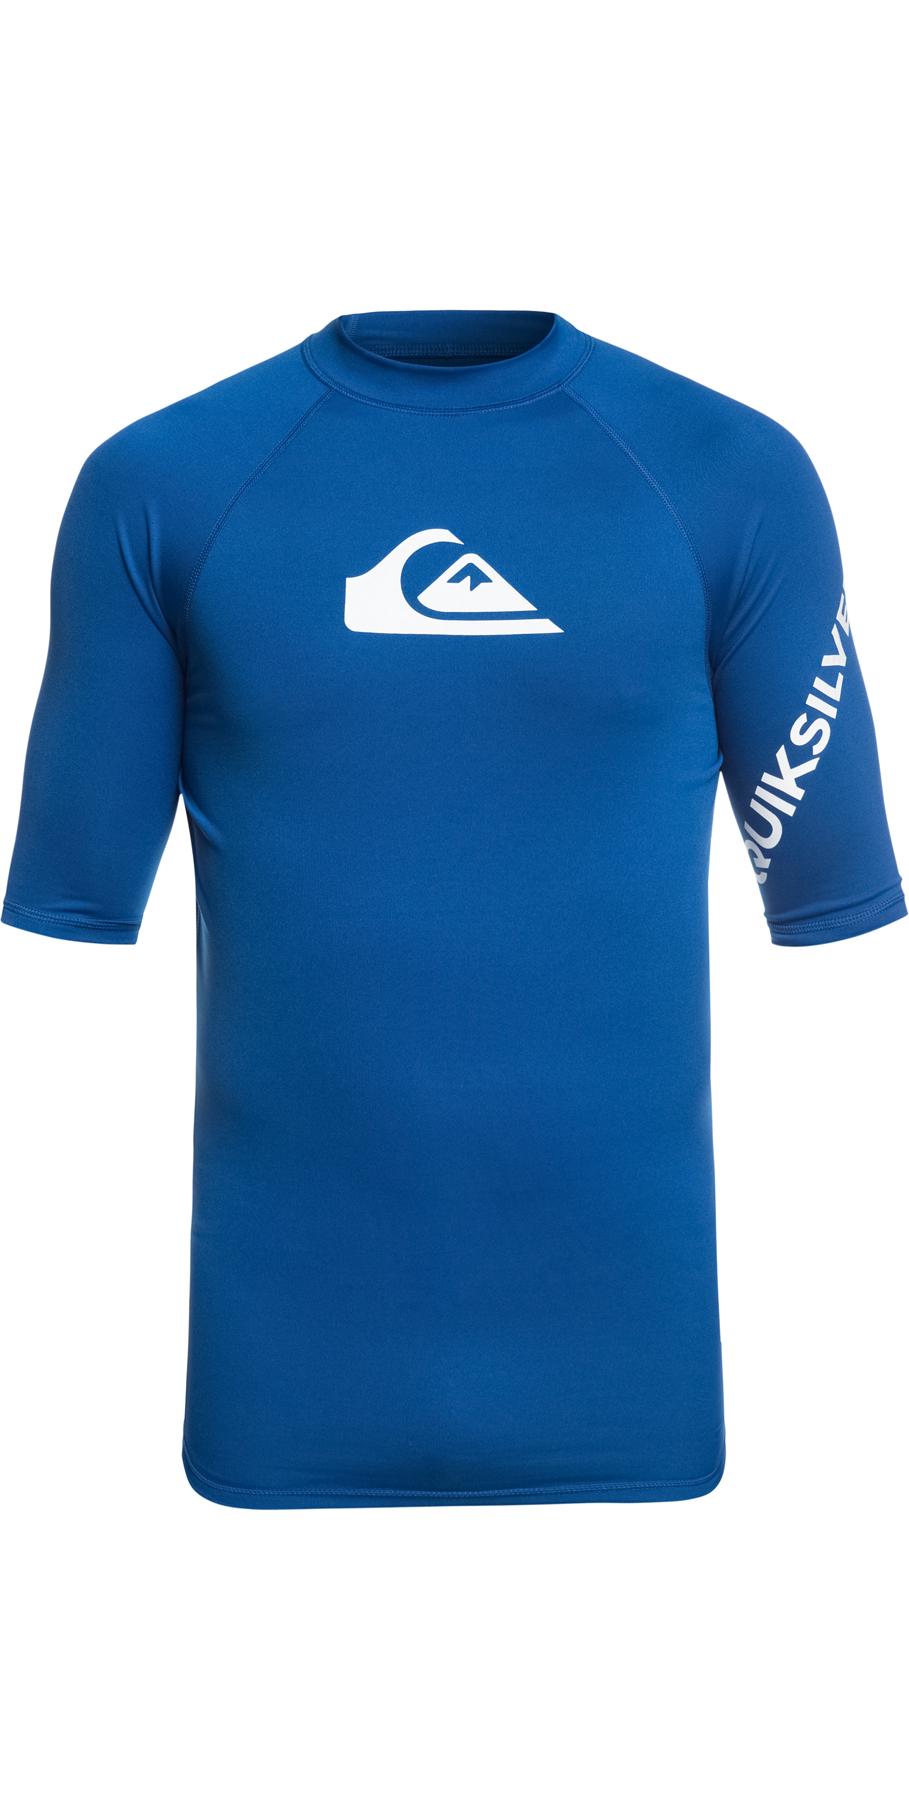 6fdf168409fdd 2019 Quiksilver All Time Short Sleeve Rash Vest Electric Royal Blue  Eqywr03136 - Short | Wetsuit Outlet